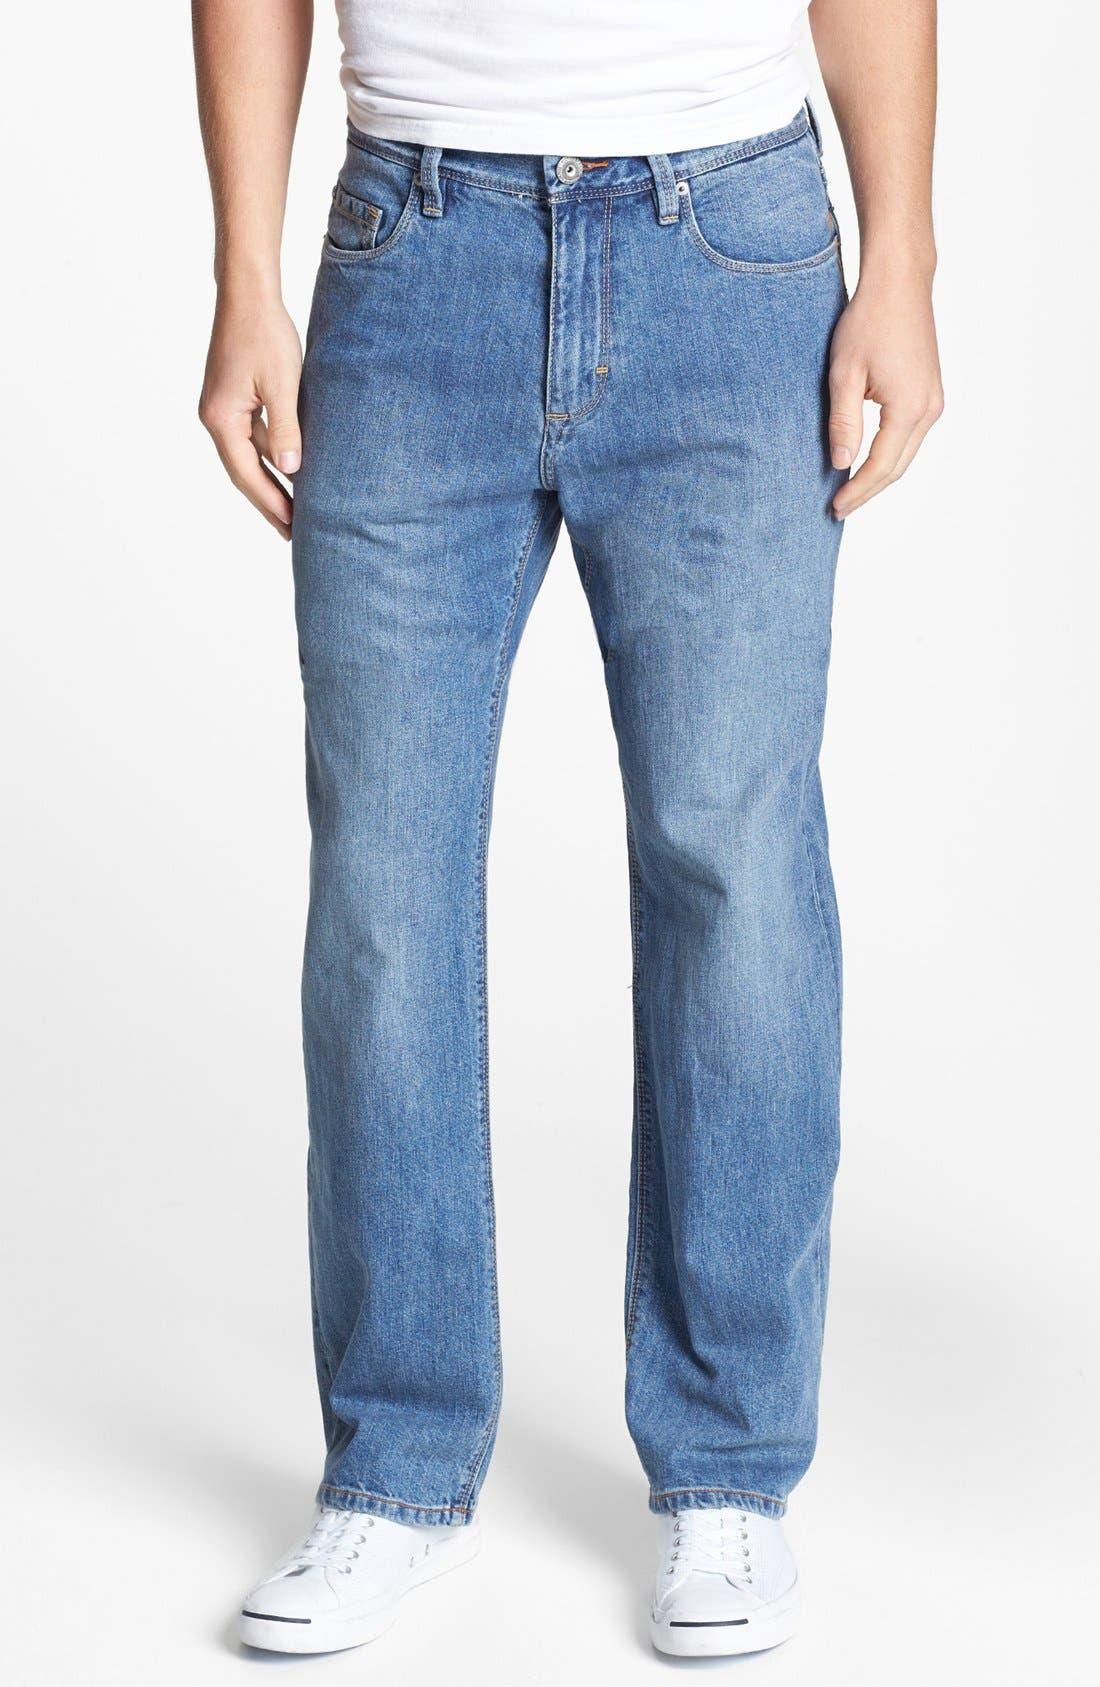 Alternate Image 1 Selected - Tommy Bahama Denim 'Stevie' Standard Fit Jeans (Beach)